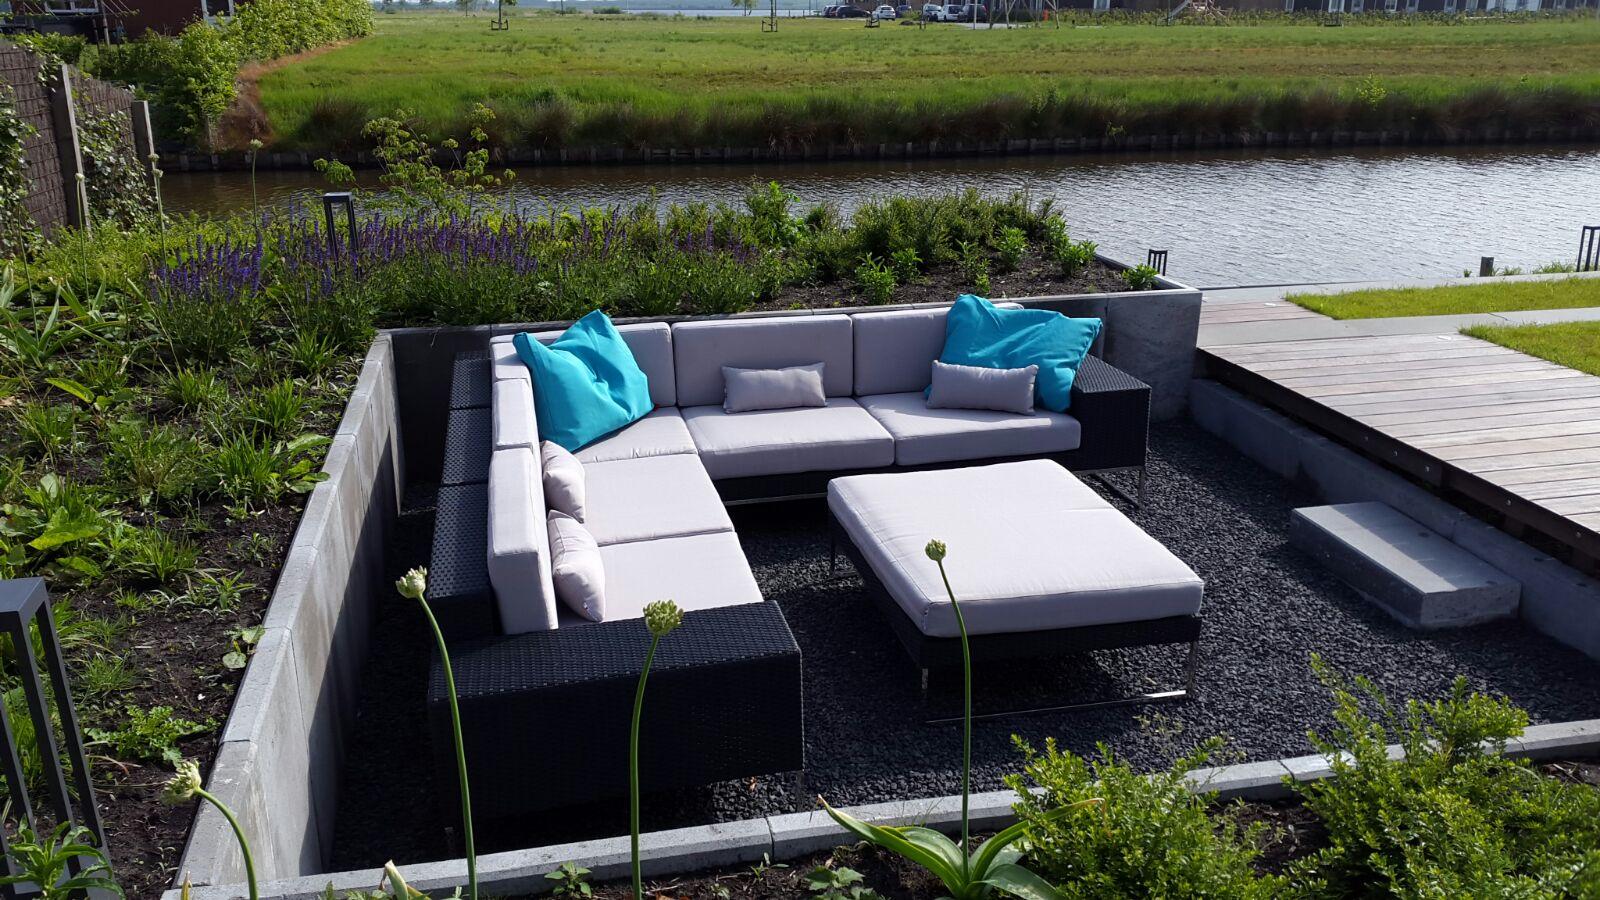 Lounge Meubelen Tuin : Lounge meubelen tuin lounge stoel tuin excellent tuin lounge